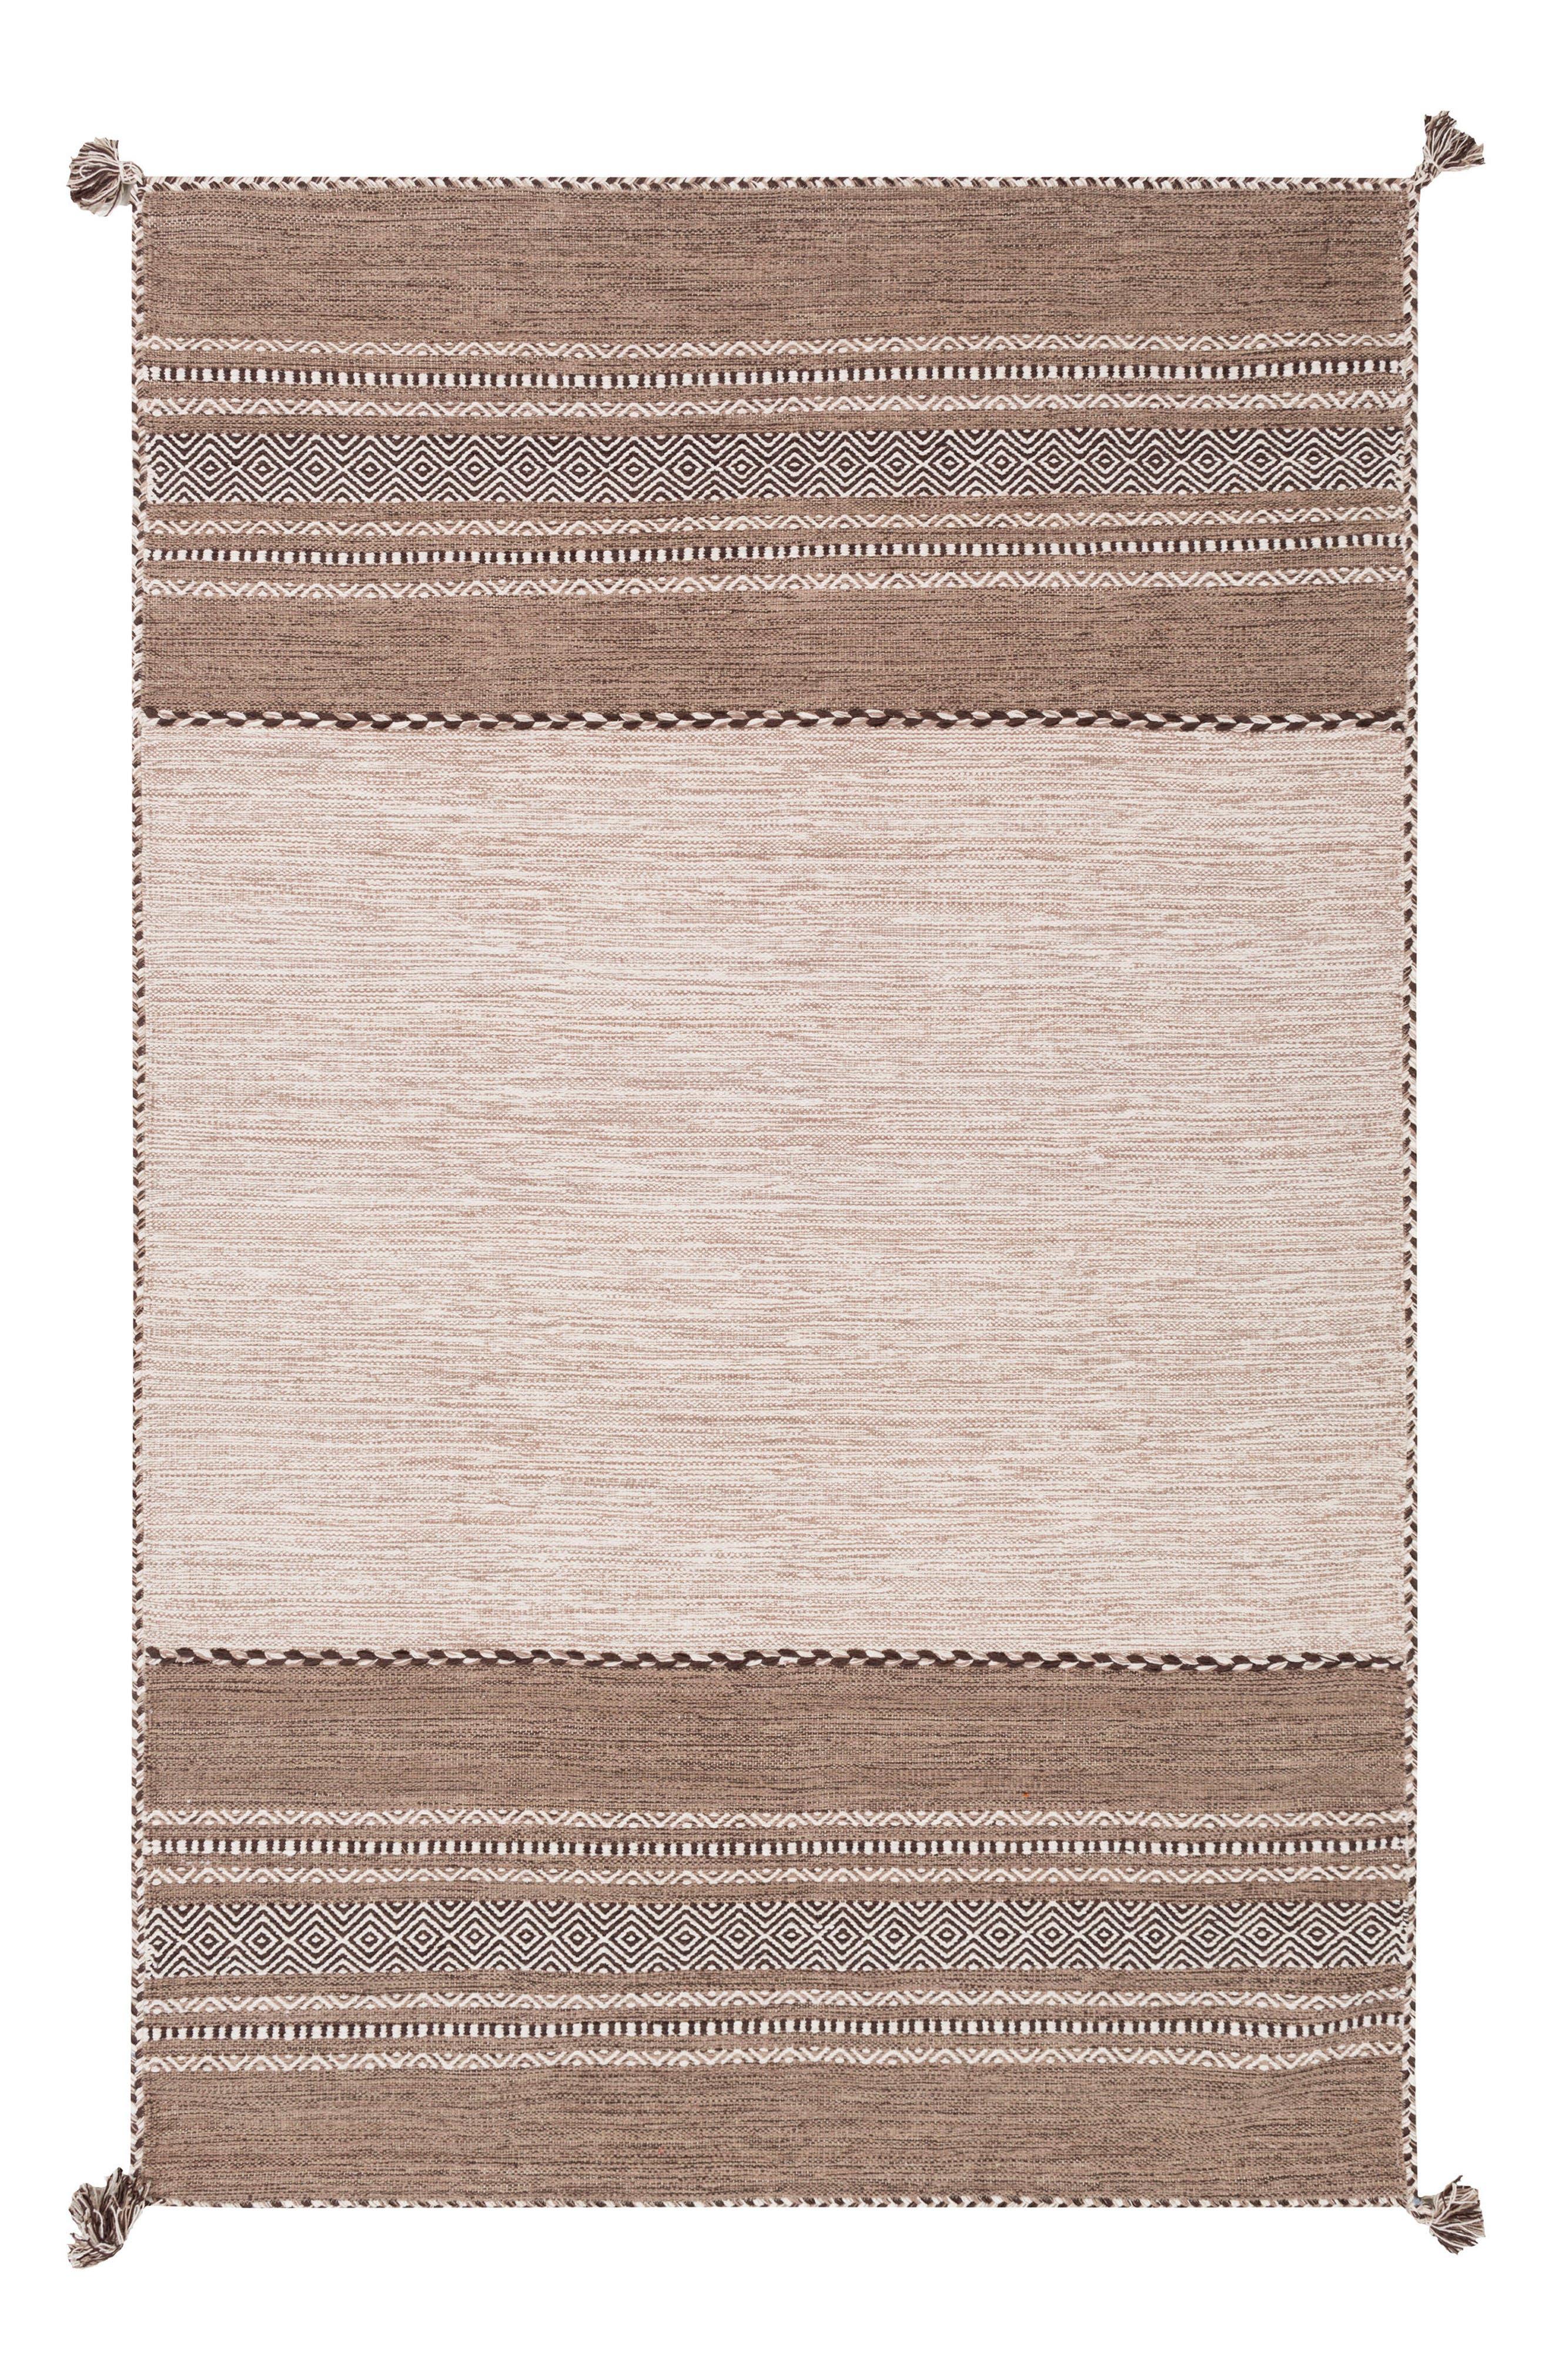 Alternate Image 1 Selected - Surya Home Trenza Global Stripe Rug